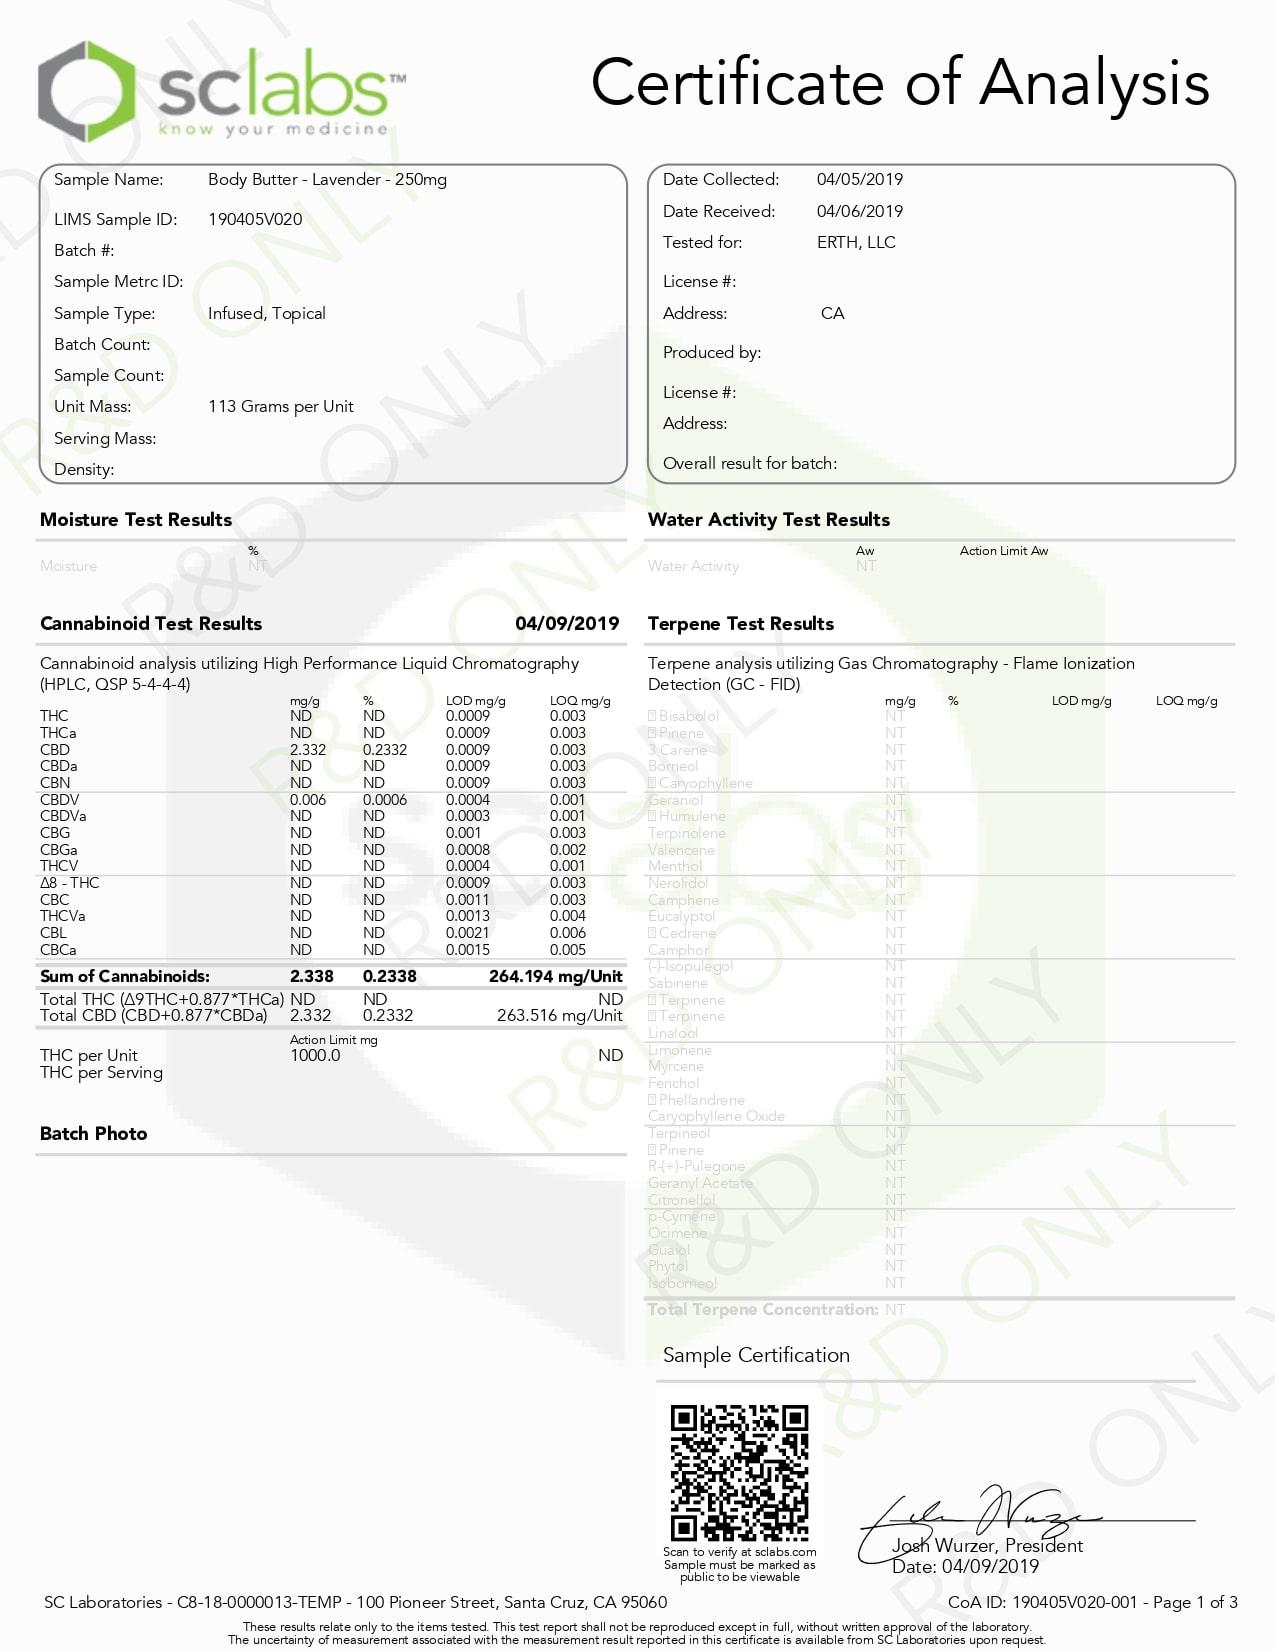 ERTH Hemp CBD Body Butter Lavender 250mg Lab Report